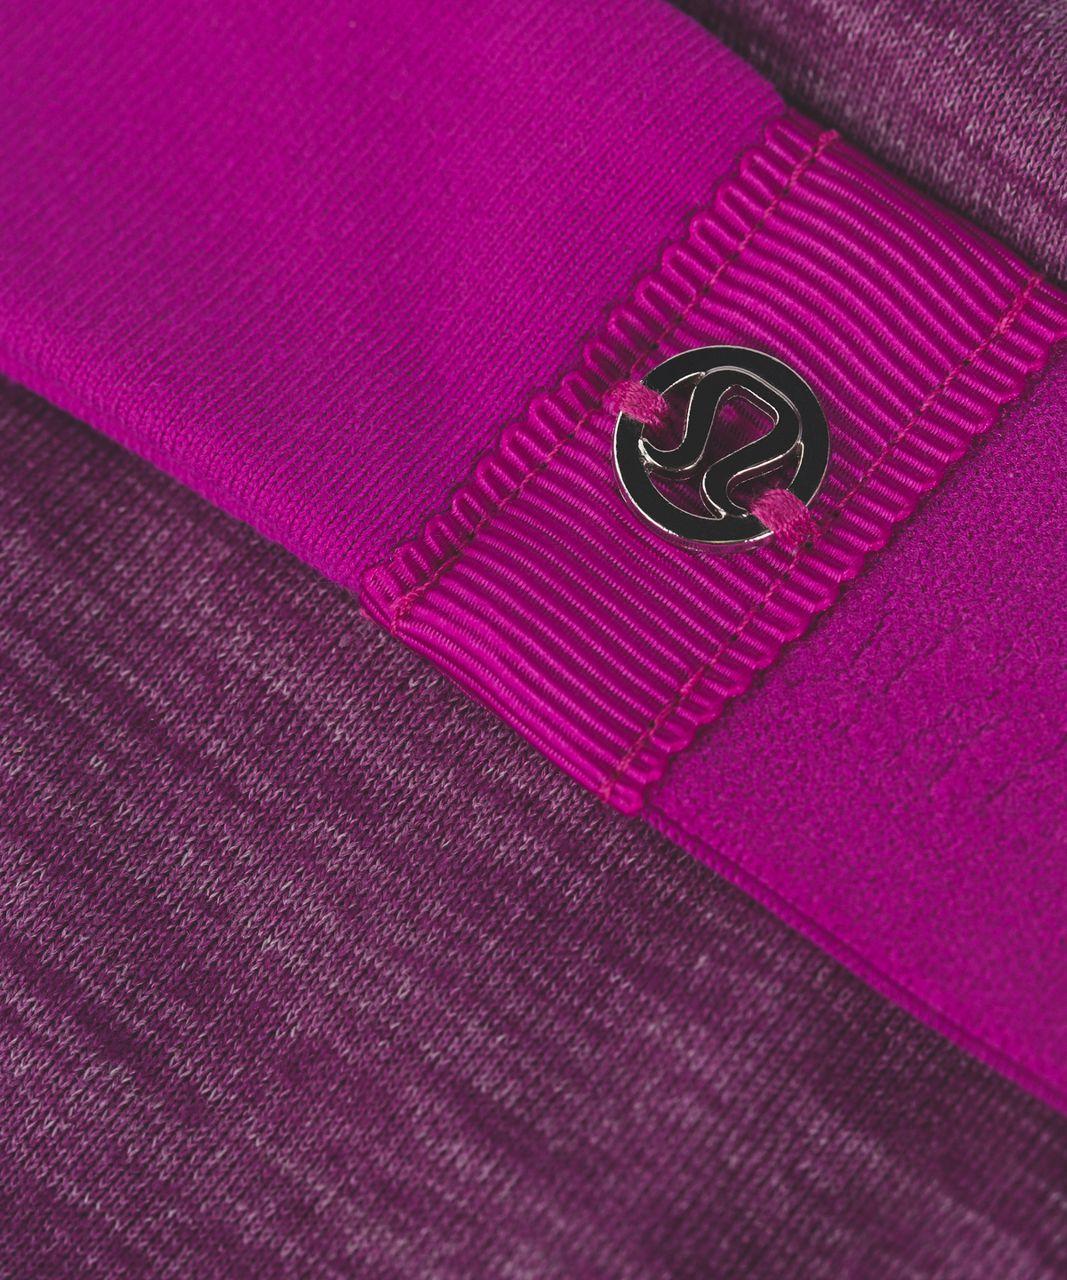 Lululemon Fringe Fighter Headband - Polar Pink / Heathered Aurora